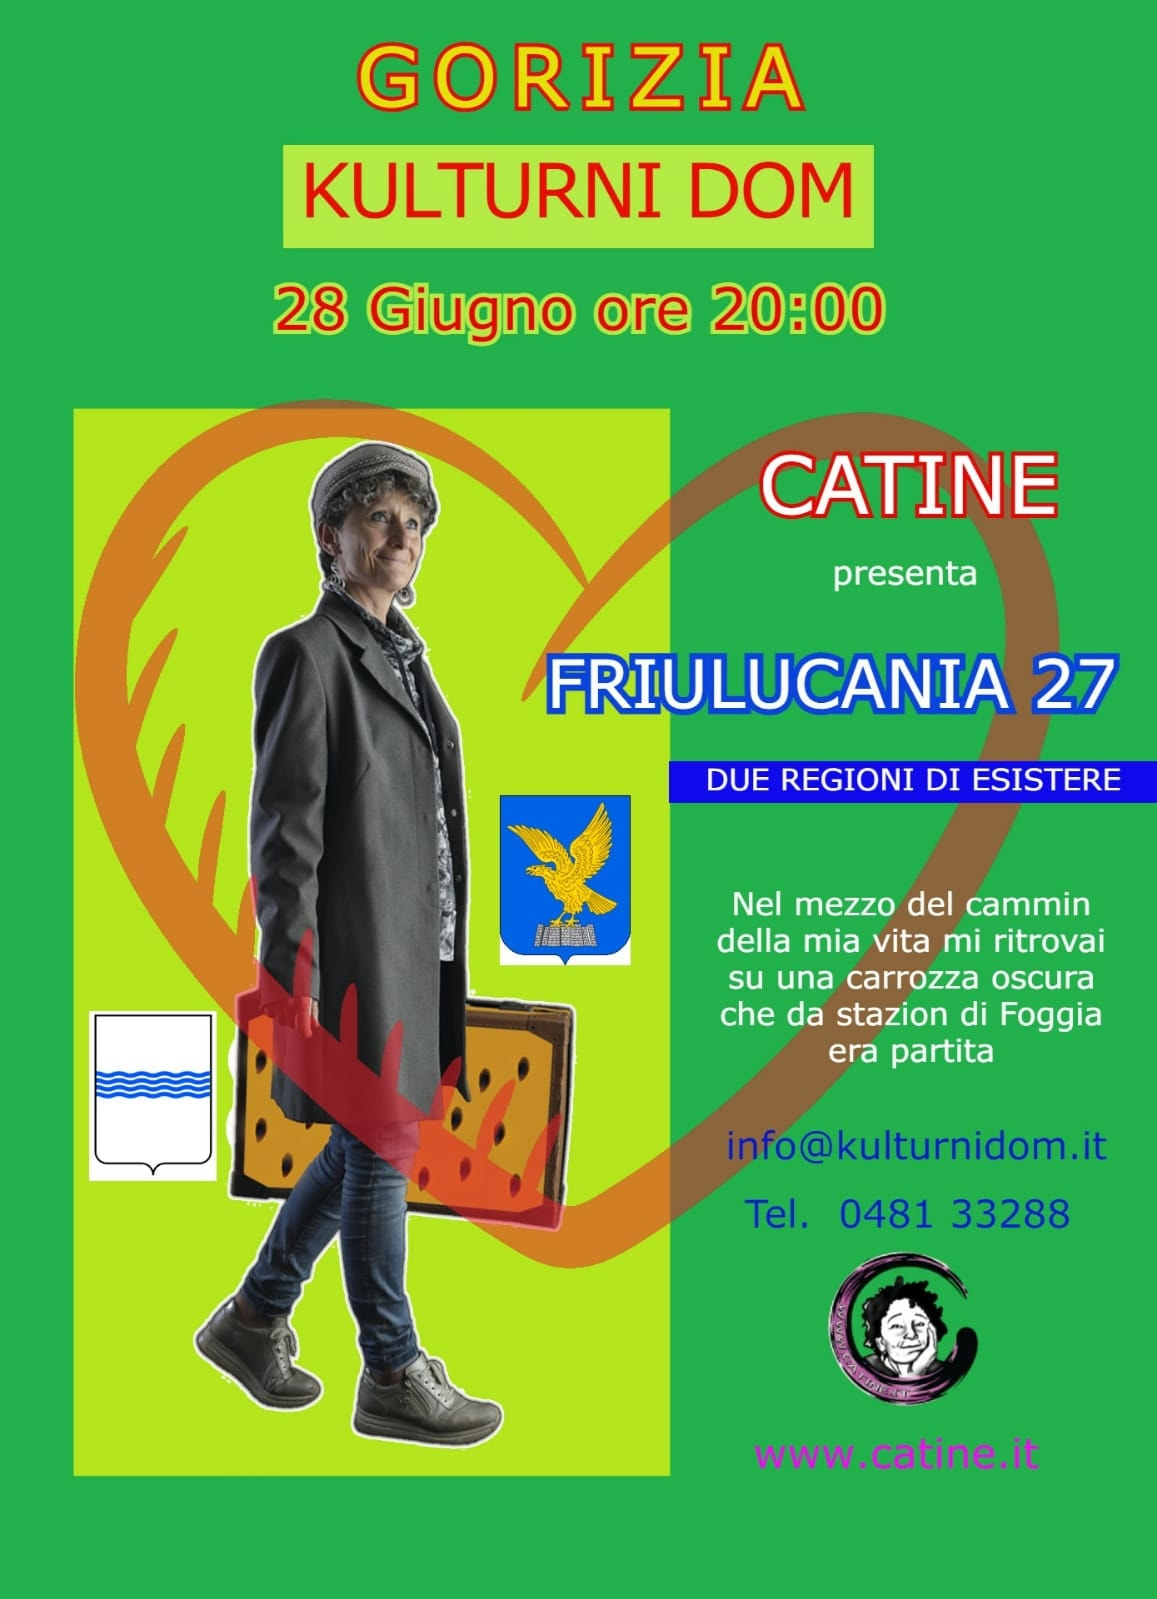 FRIULUCANIA 27. DUE REGIONI DI ESISTERE